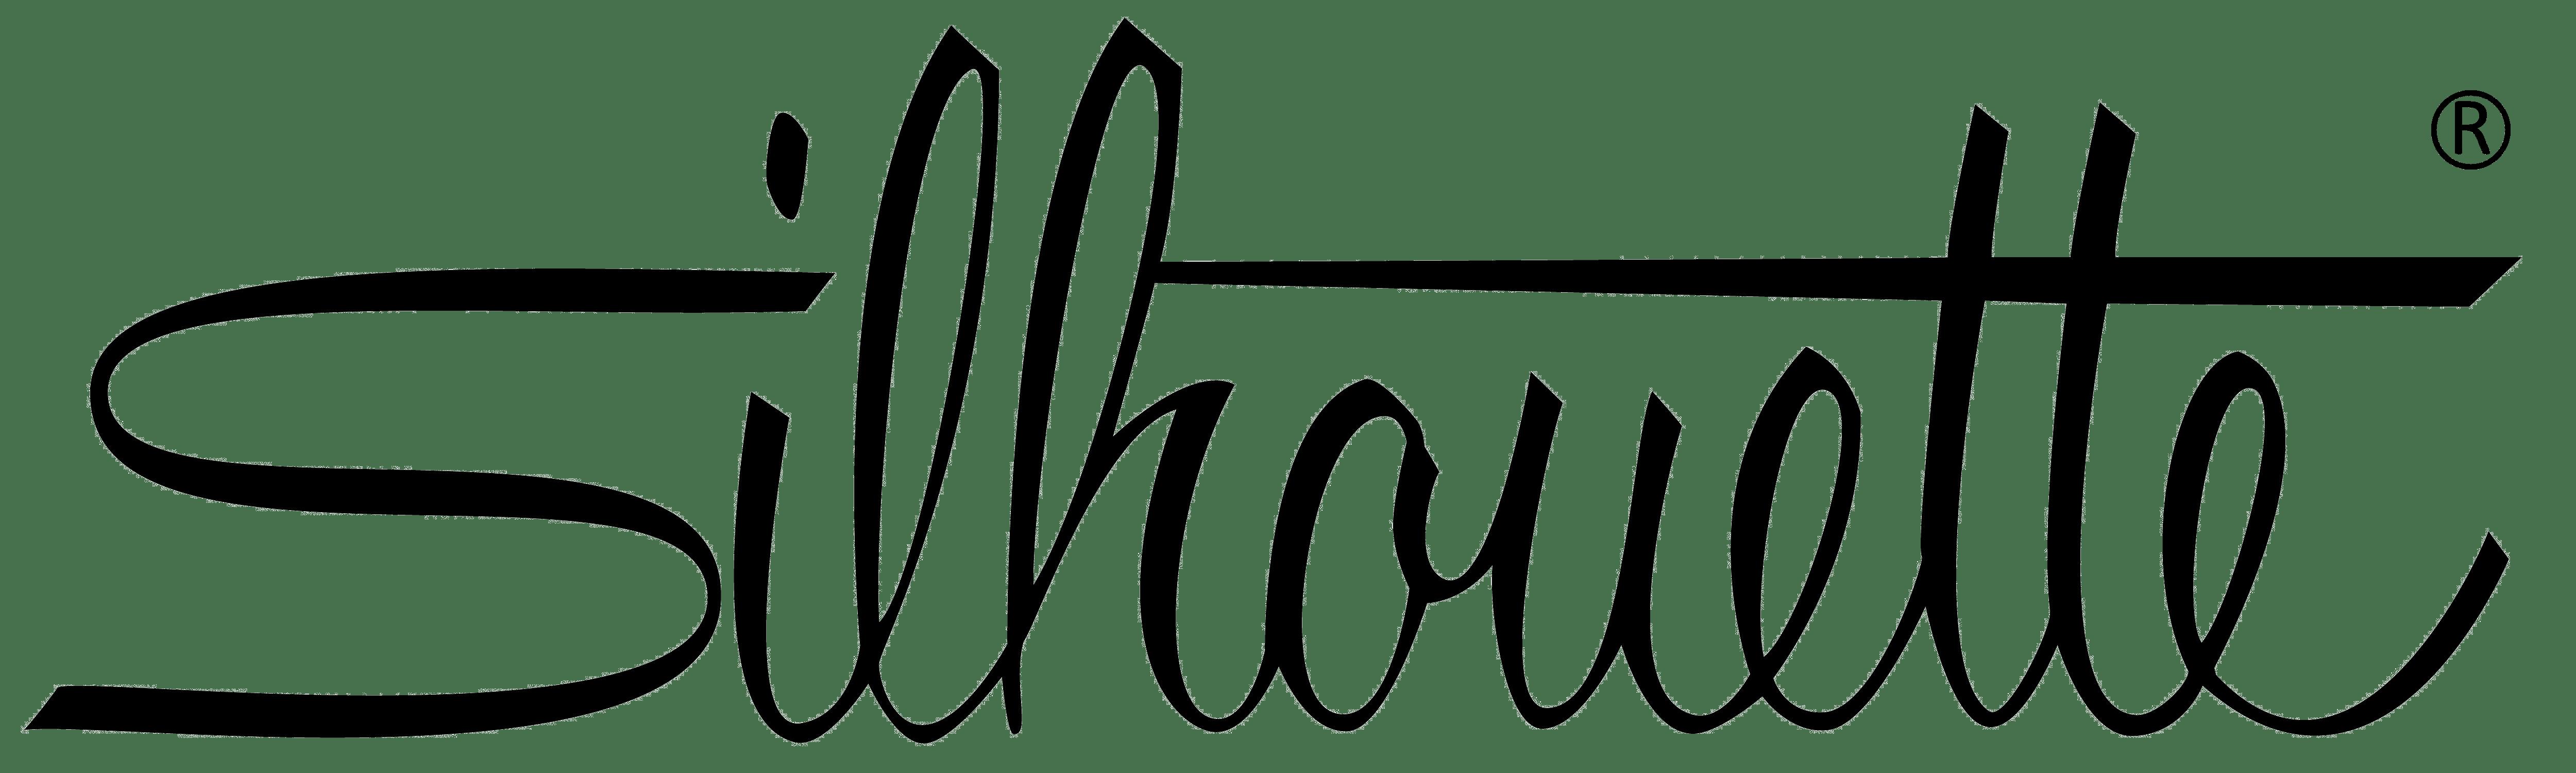 Silhouette_logo_logotype-min